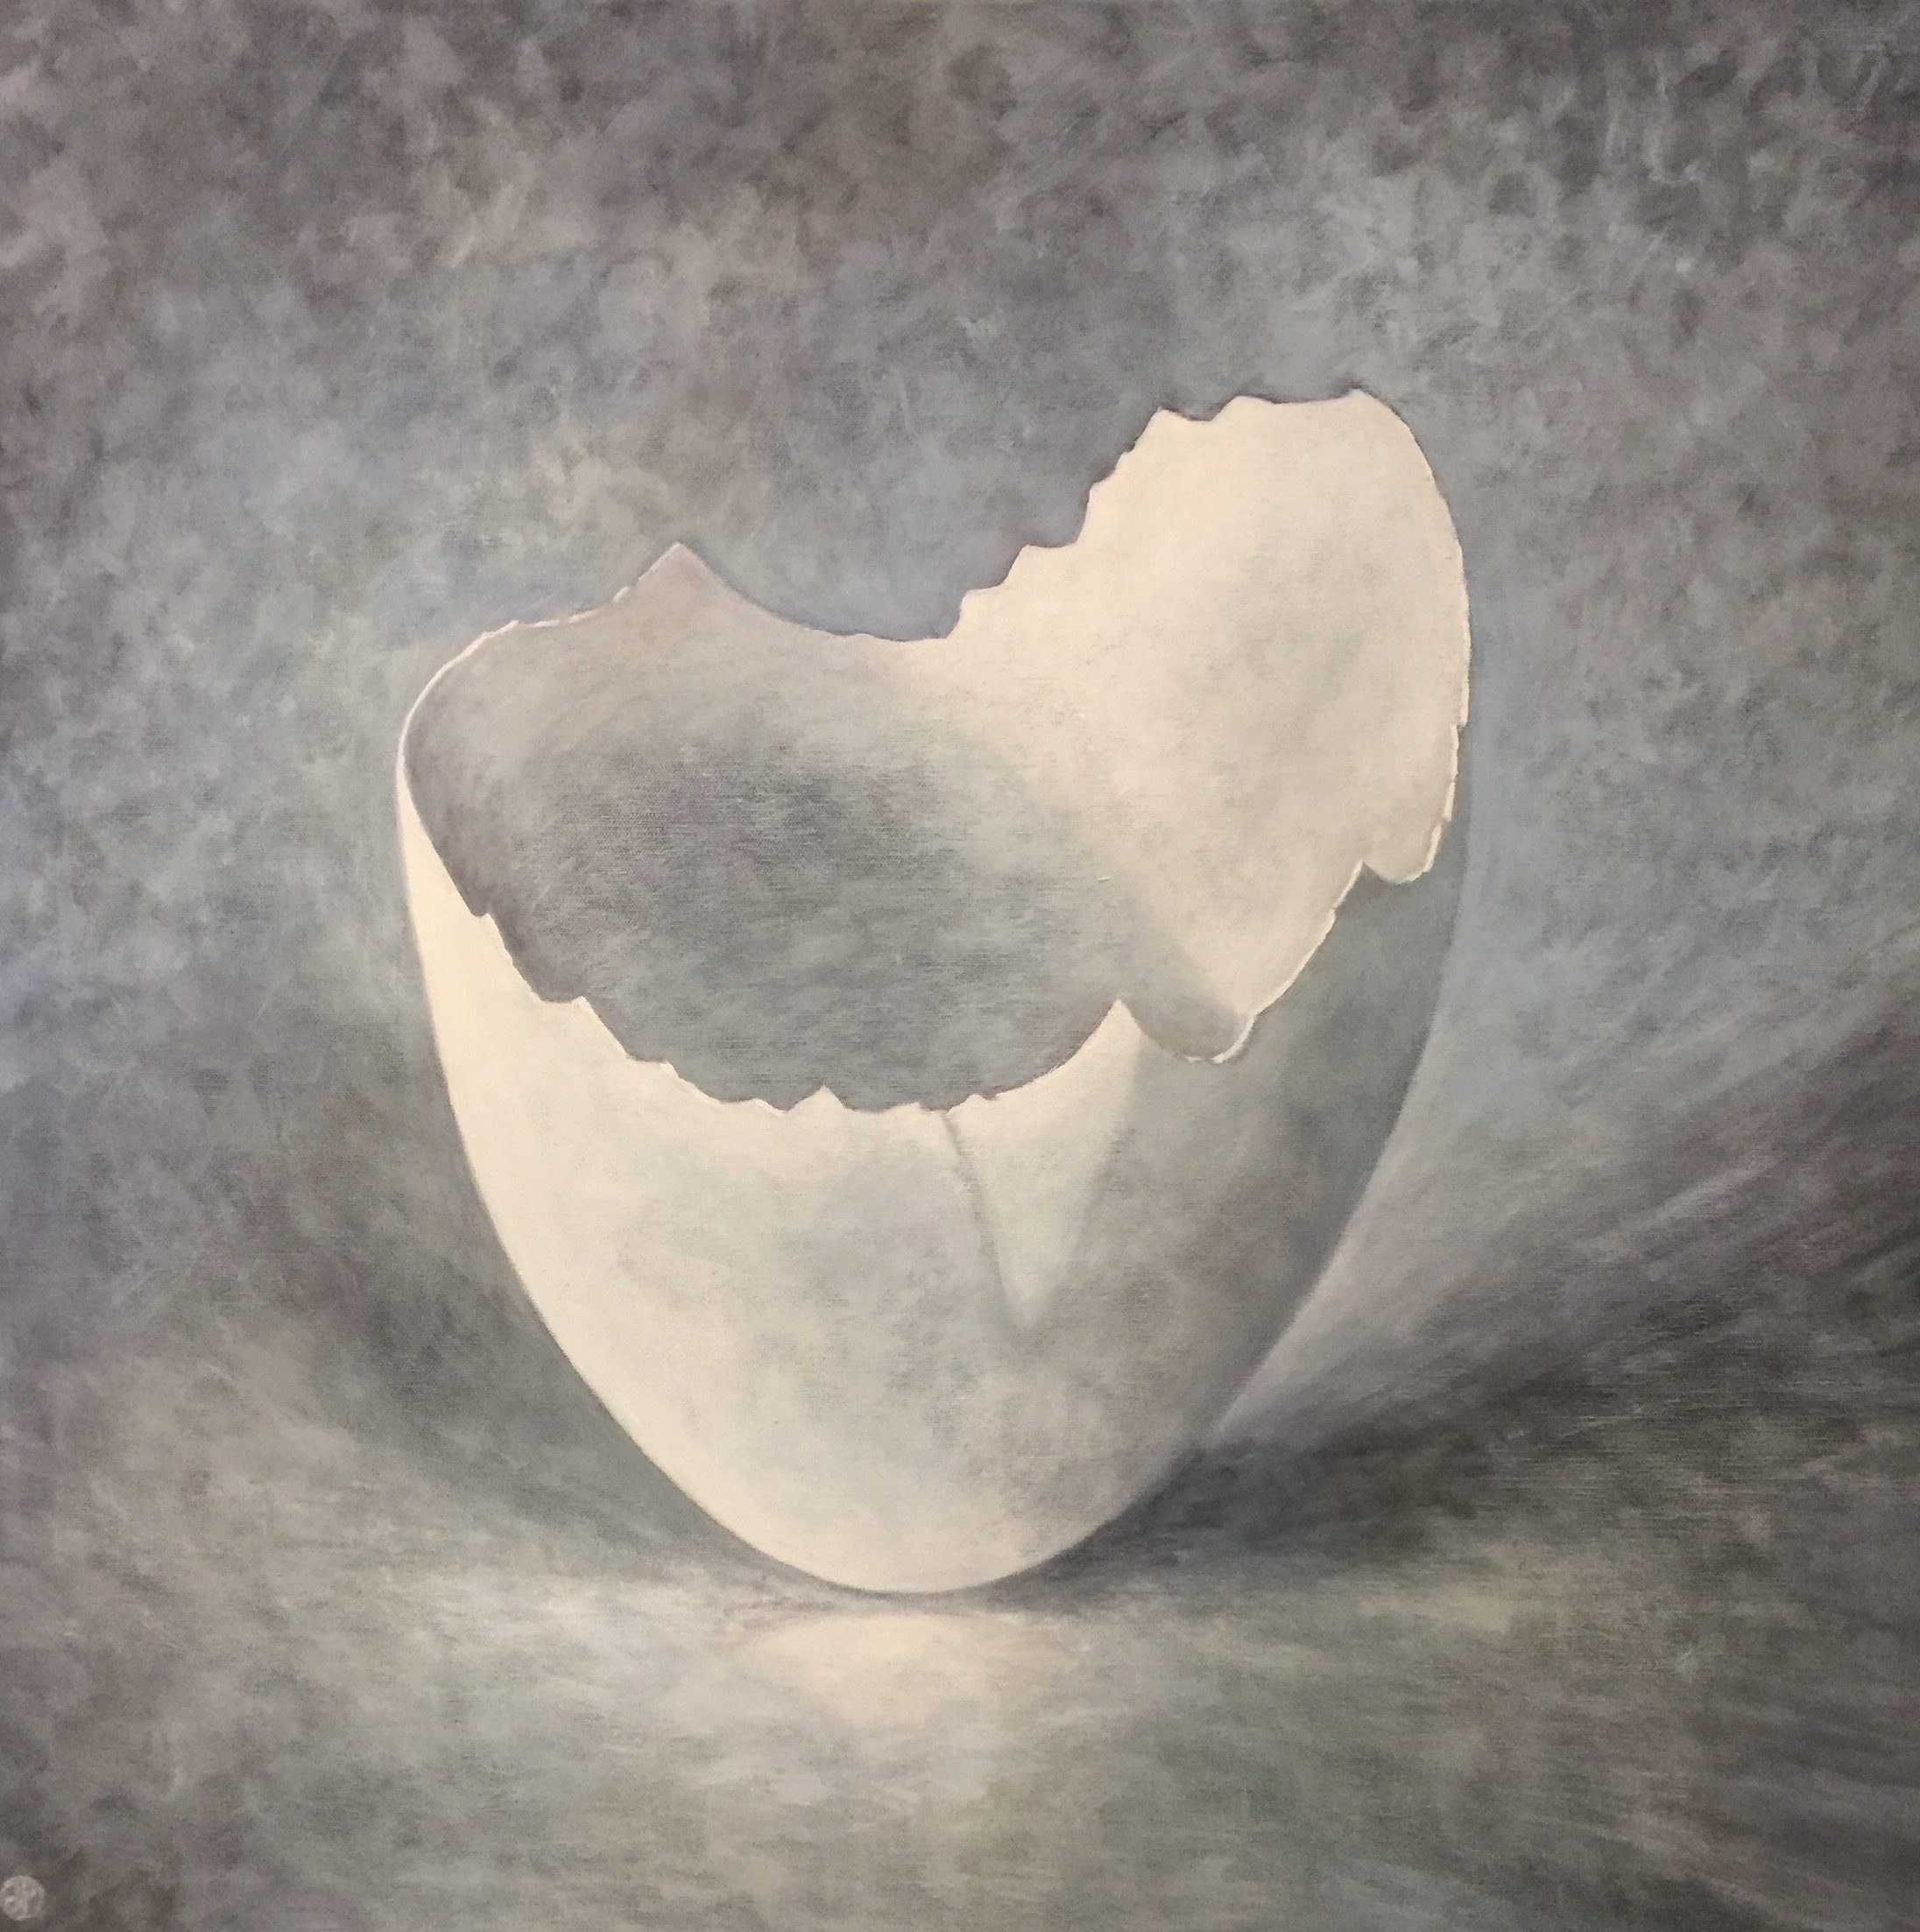 <span class=&#34;link fancybox-details-link&#34;><a href=&#34;/artists/34-joyce-pinch/works/1817-joyce-pinch-broken-white-egg/&#34;>View Detail Page</a></span><div class=&#34;artist&#34;><strong>Joyce Pinch</strong></div> <div class=&#34;title&#34;><em>Broken White Egg</em></div> <div class=&#34;medium&#34;>Acrylic on Canvas</div> <div class=&#34;dimensions&#34;>77 x 77 cm</div><div class=&#34;price&#34;>£600.00</div><div class=&#34;copyright_line&#34;>Copyright The Artist</div>